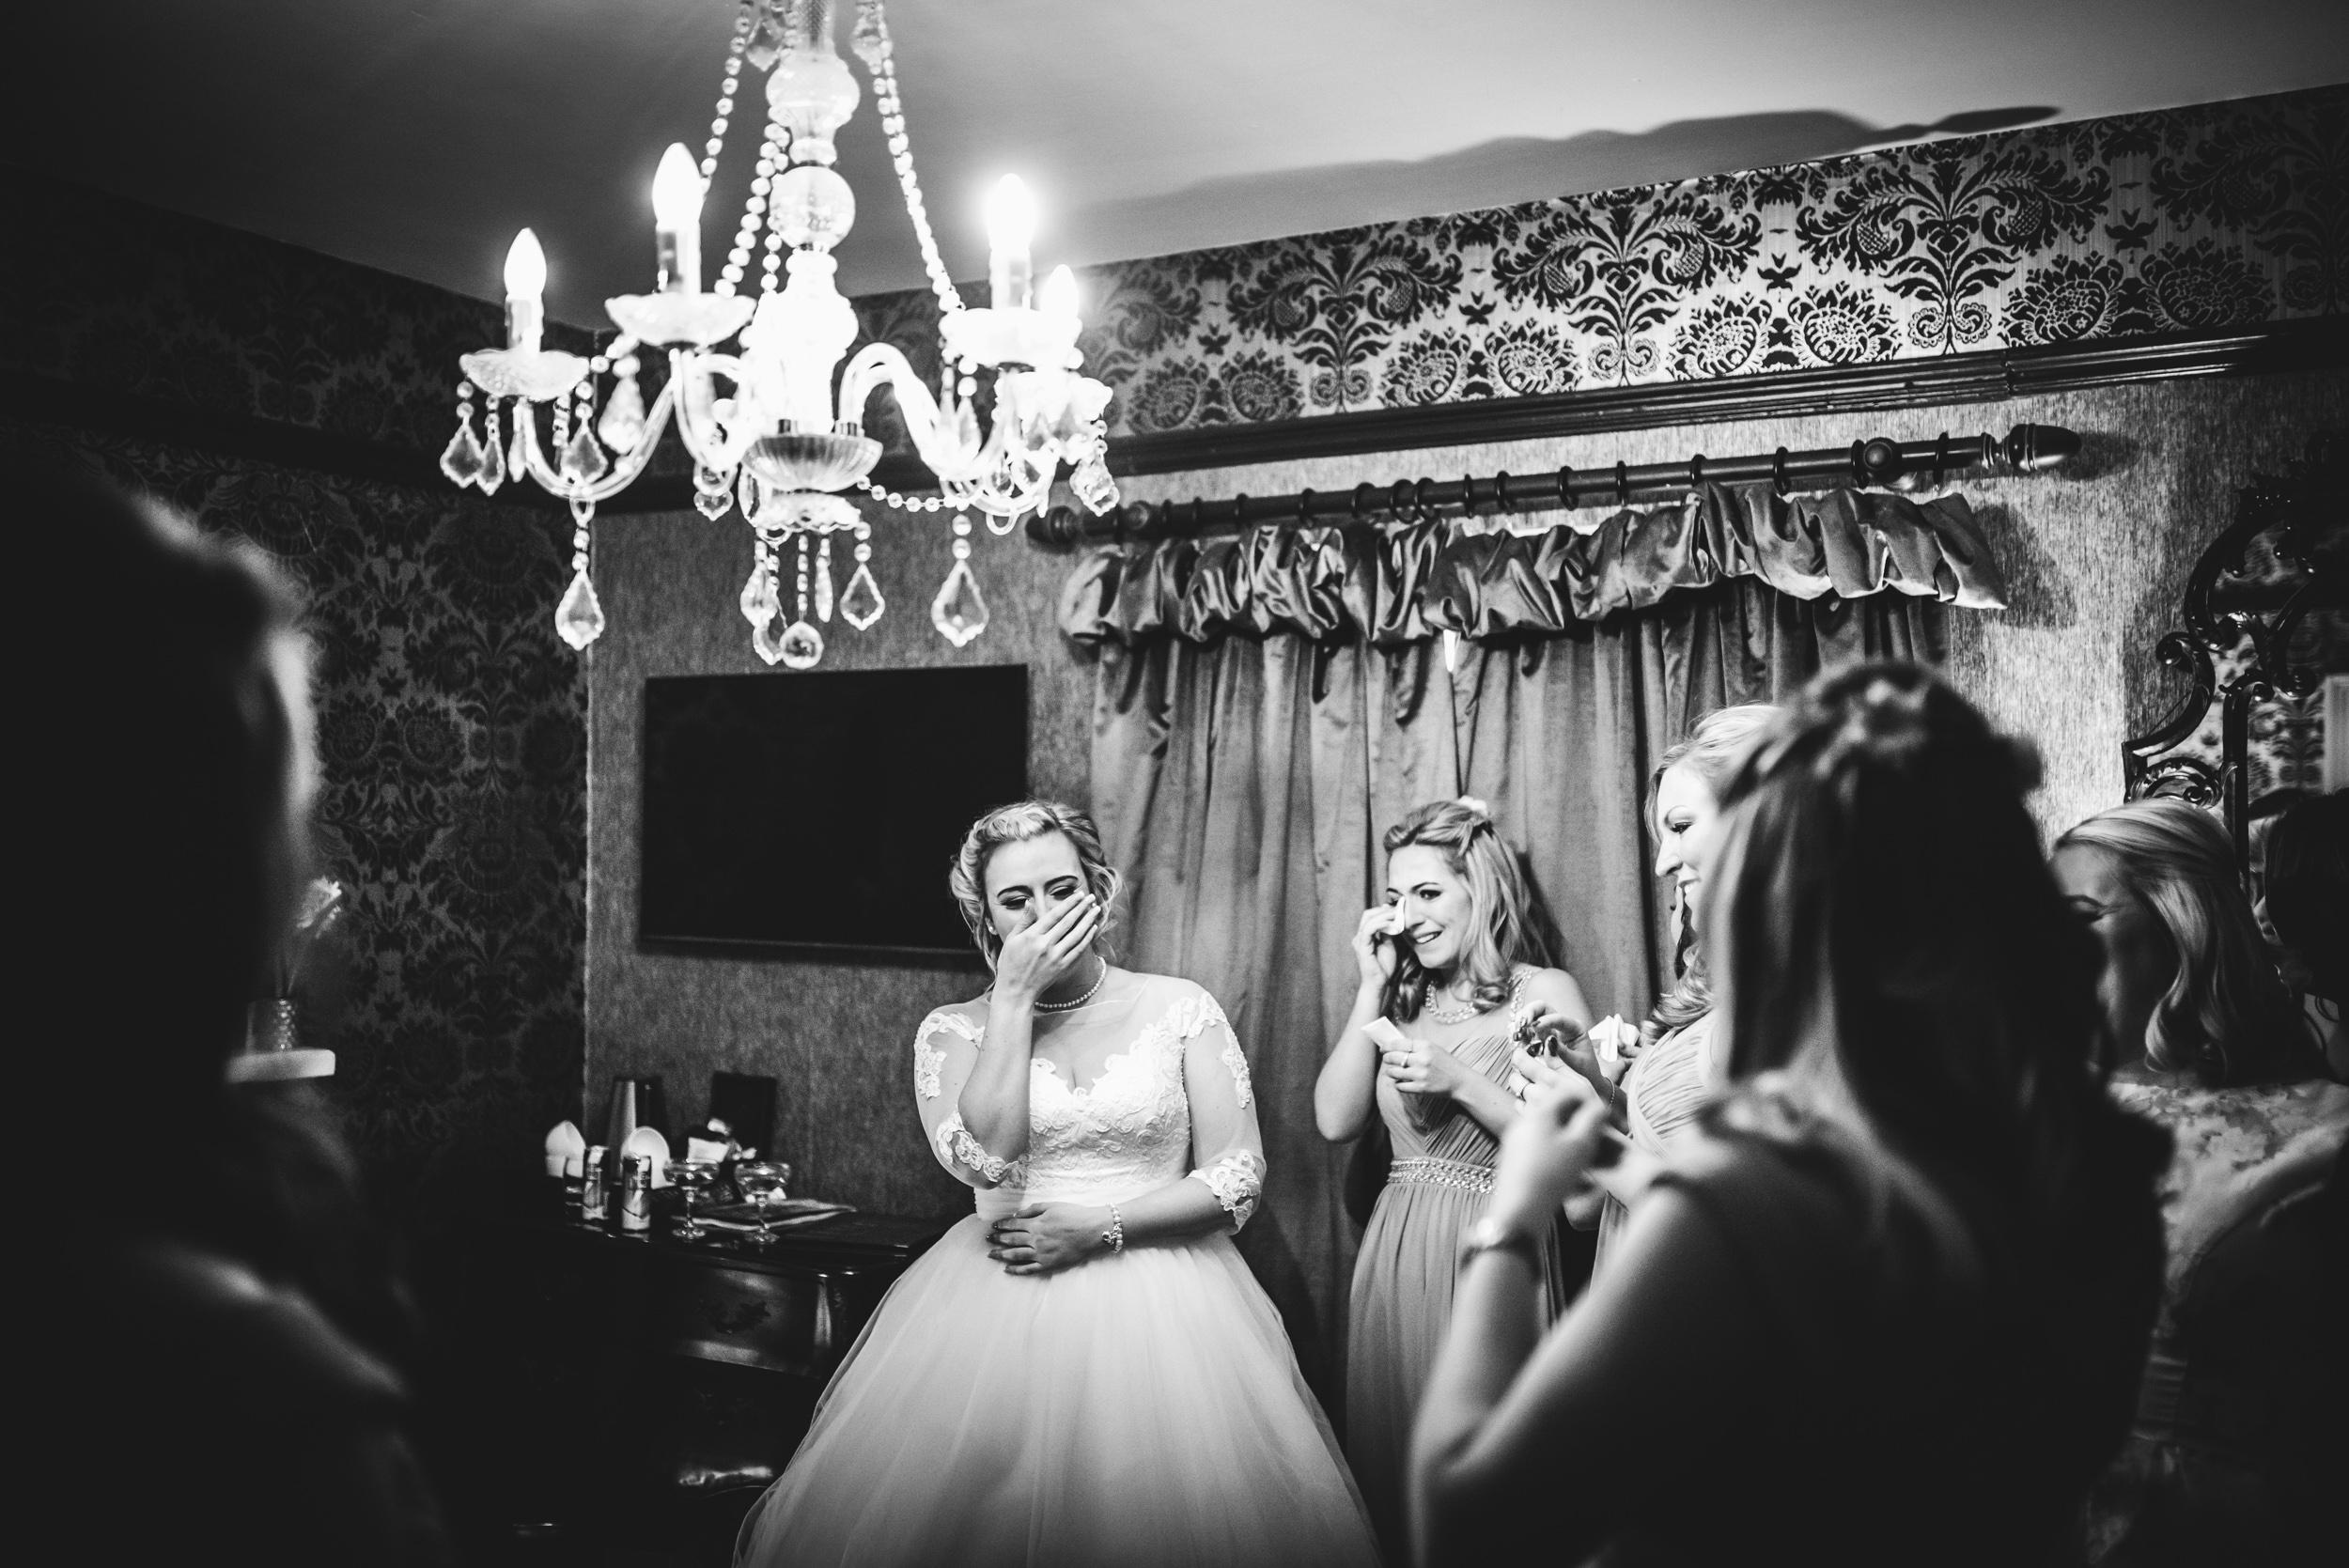 David Scholes Lancashire wedding photography 2016-186.jpg